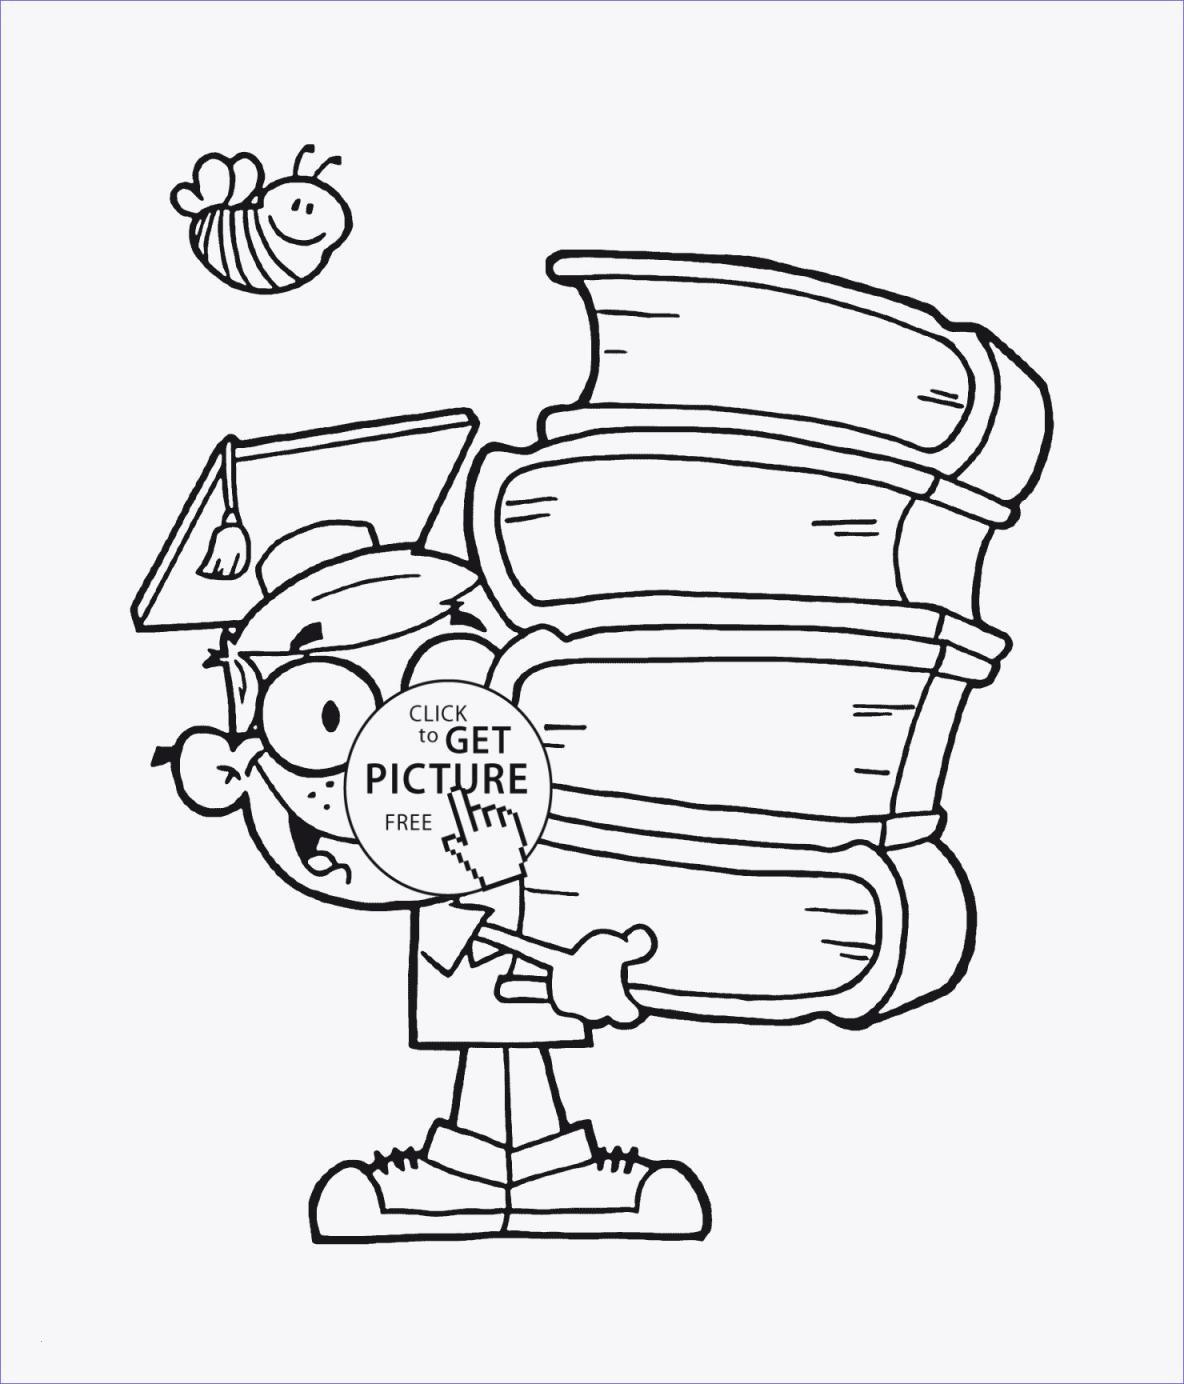 Mandala Zum Ausdrucken Rosen Neu Malvorlagen Igel Frisch Igel Grundschule 0d Archives Uploadertalk Bild